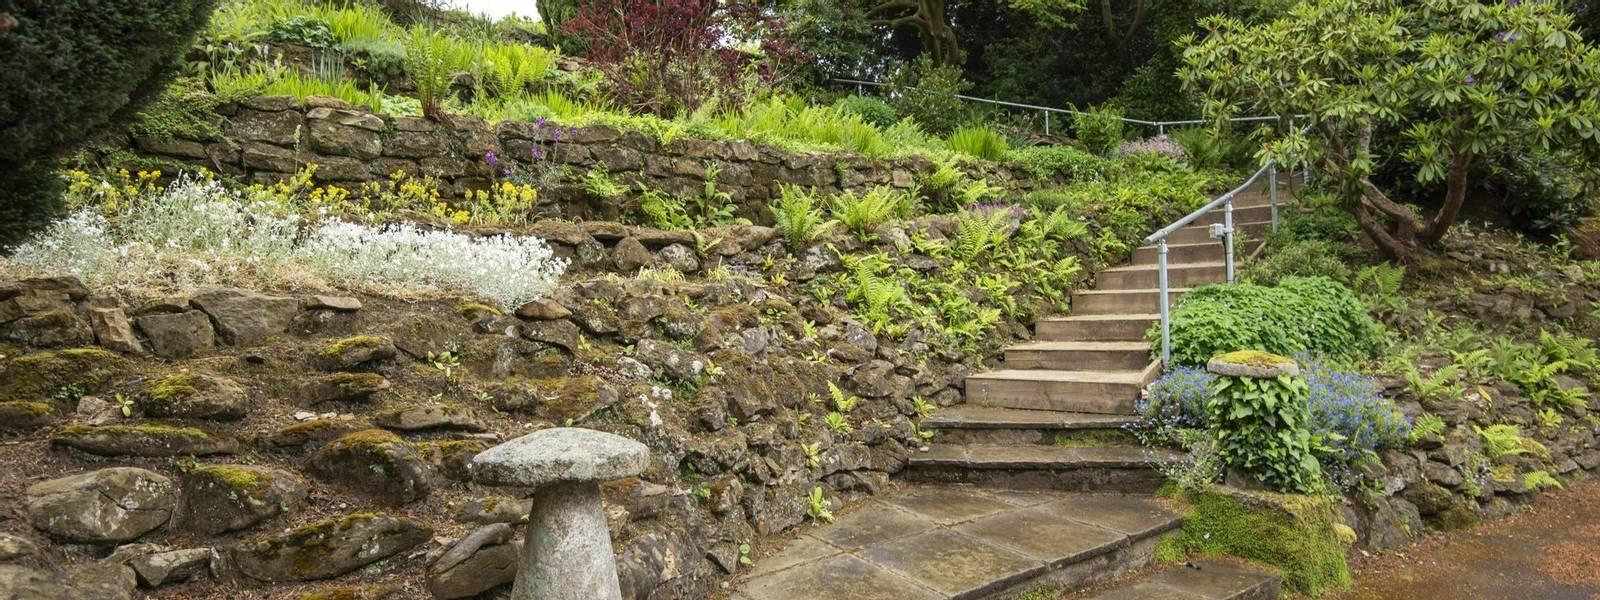 10688_0104 - Abingworth Hall - Garden